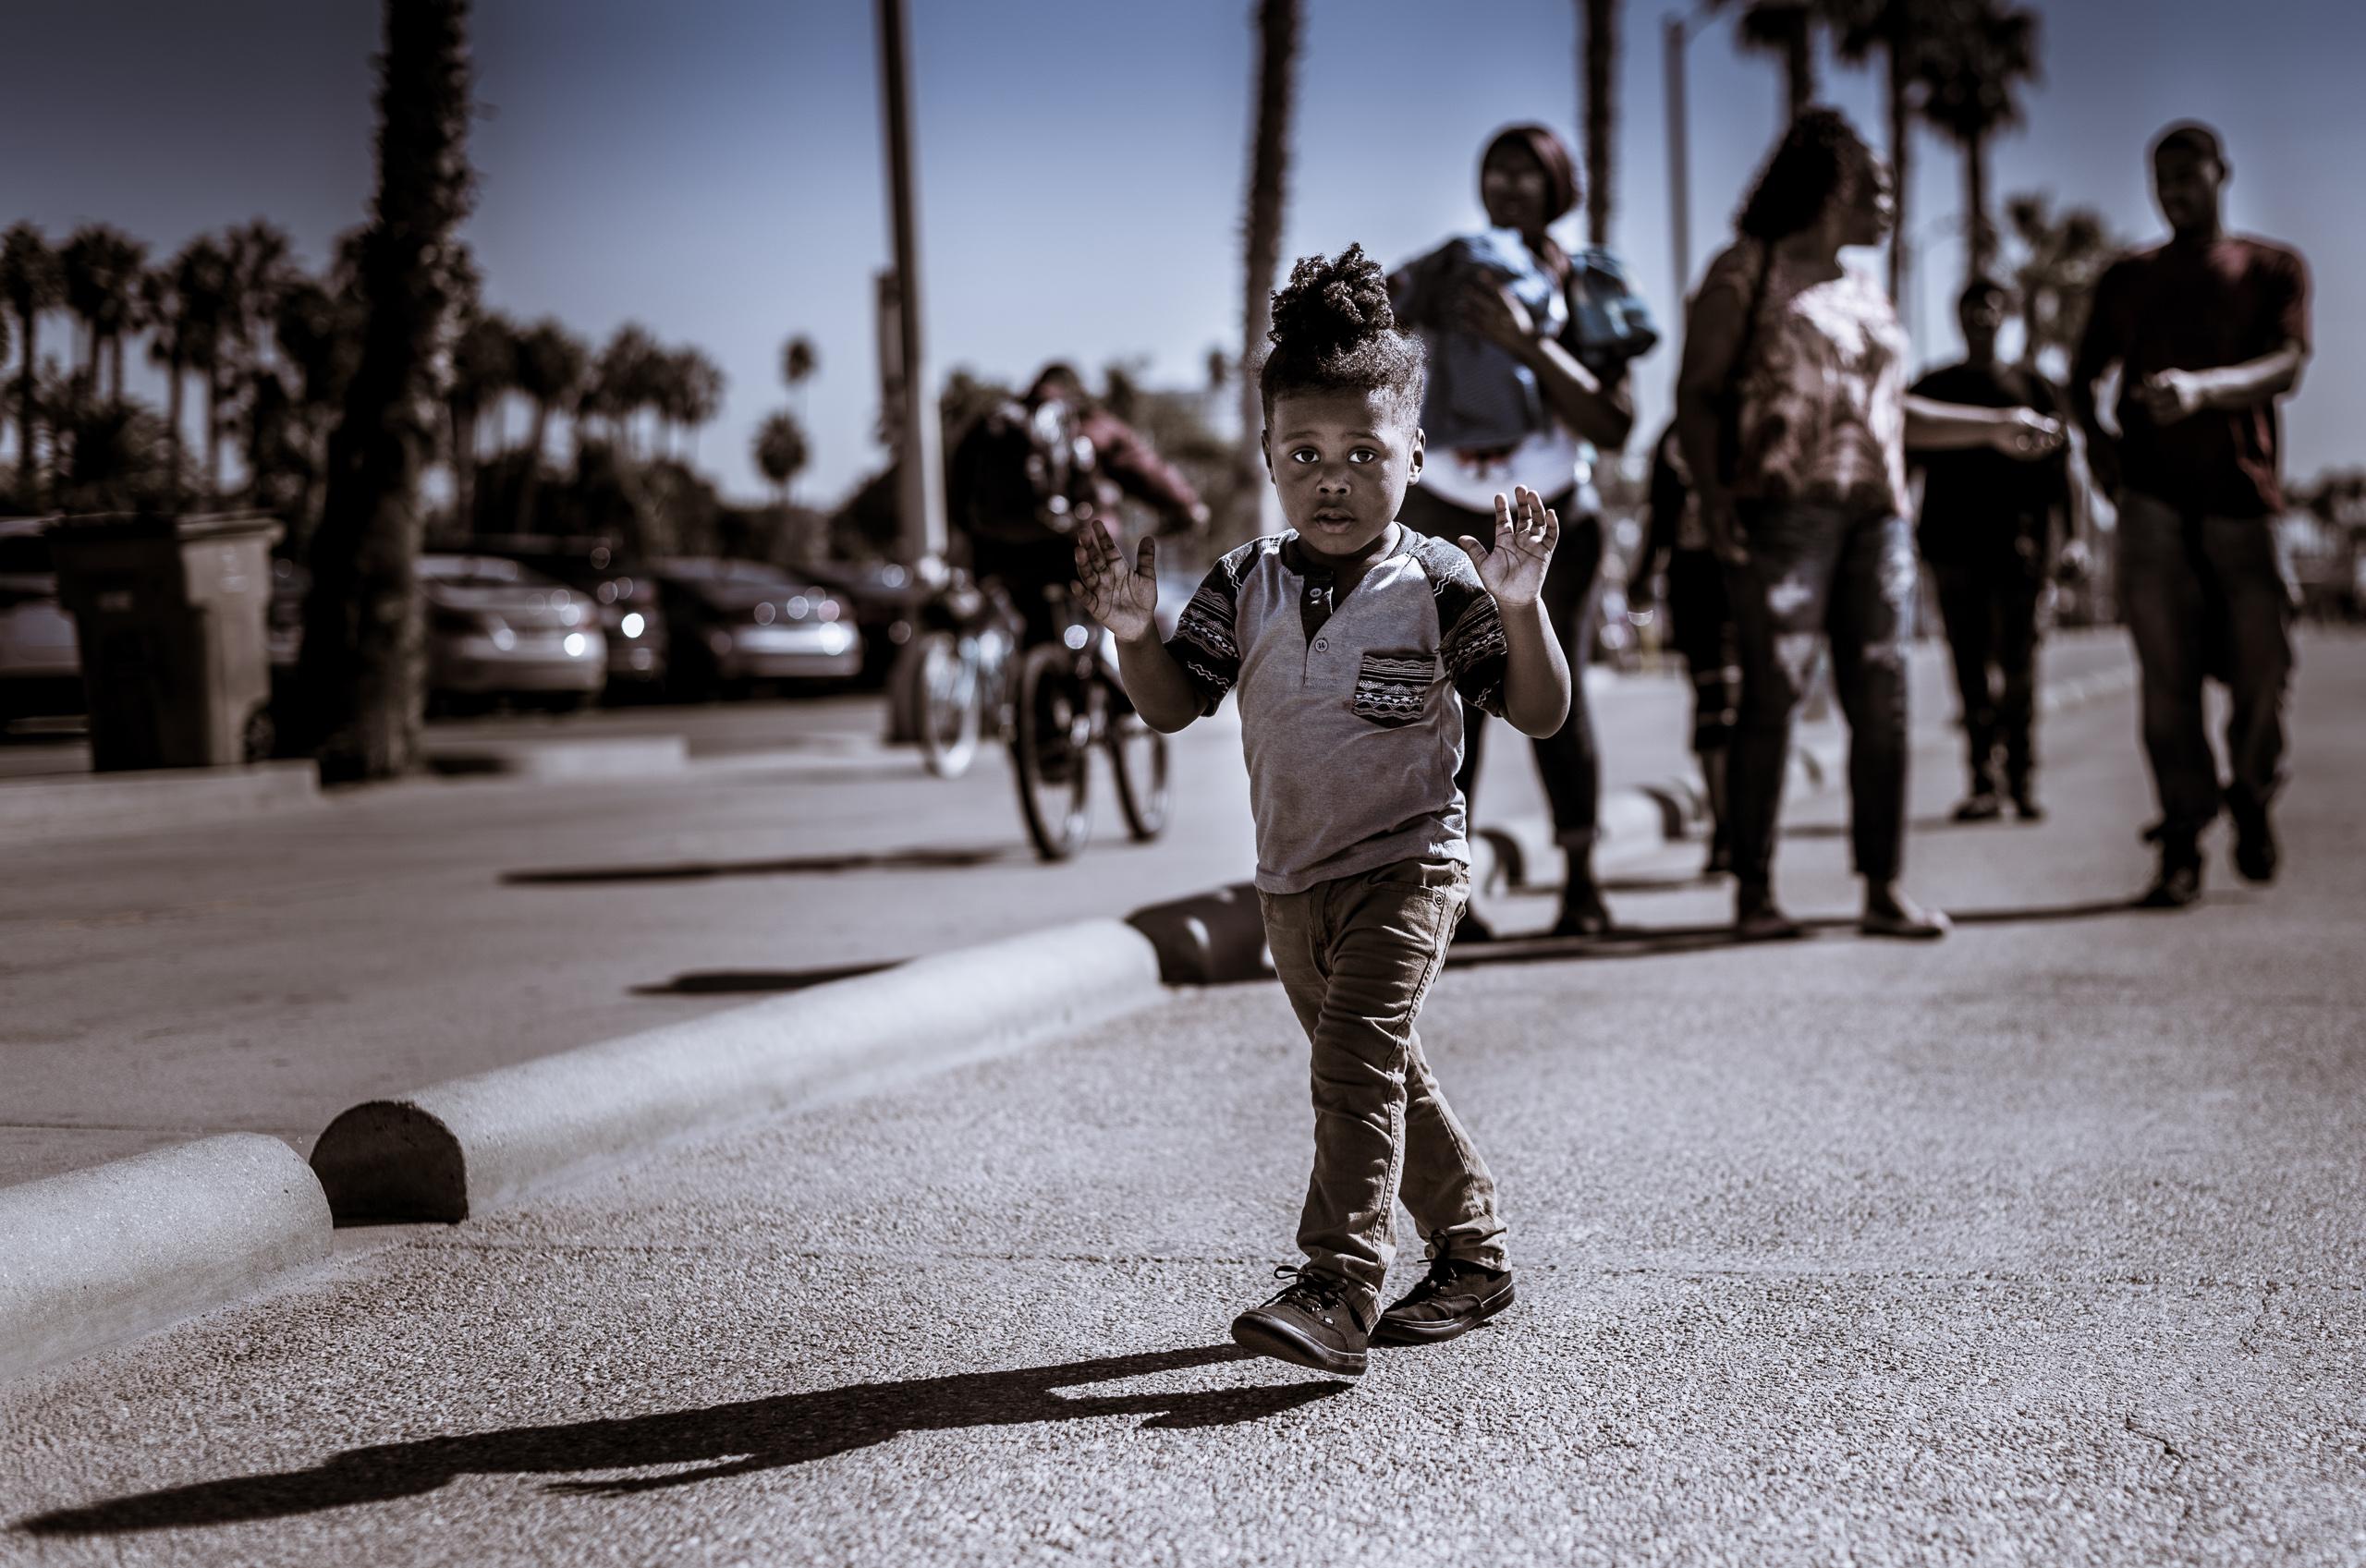 a young child walks along the pedestrian path between  Venice Beach and Santa Monica